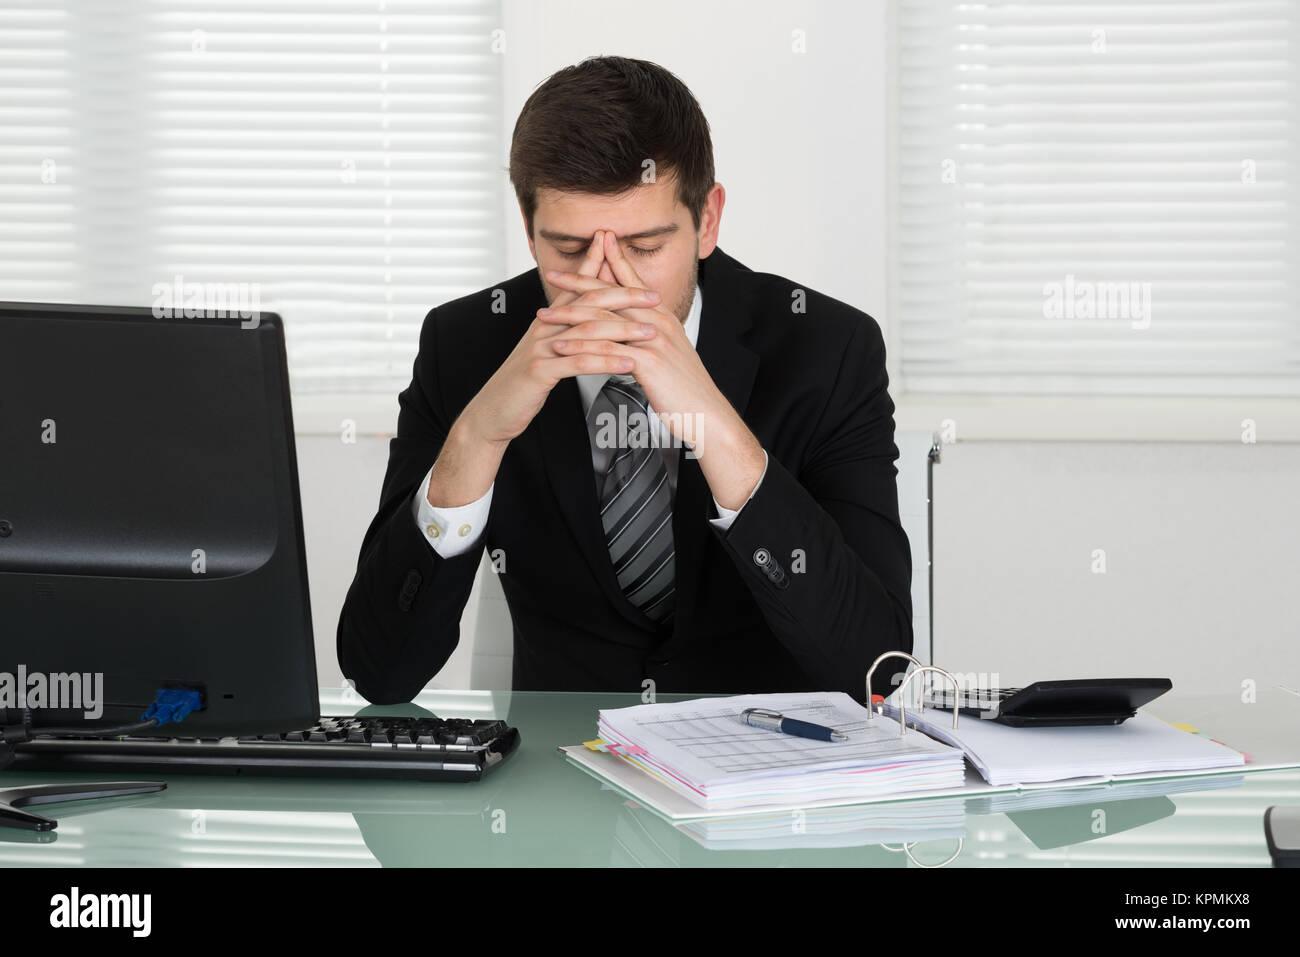 Stressed Businessman Calculating Bill - Stock Image